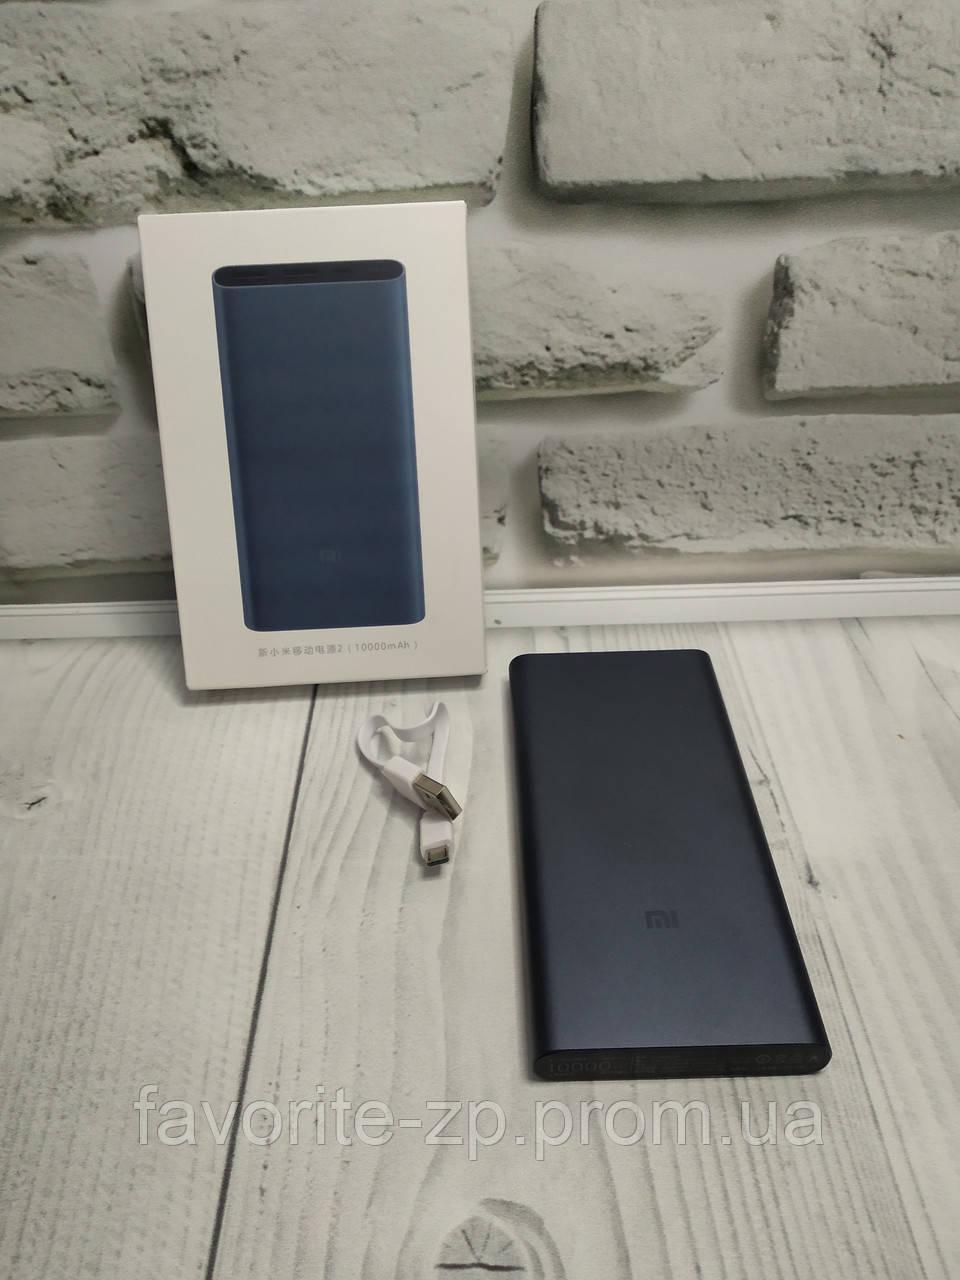 Xiaomi Mi Power Bank на 10000 mAh+ПОДАРОК!!!